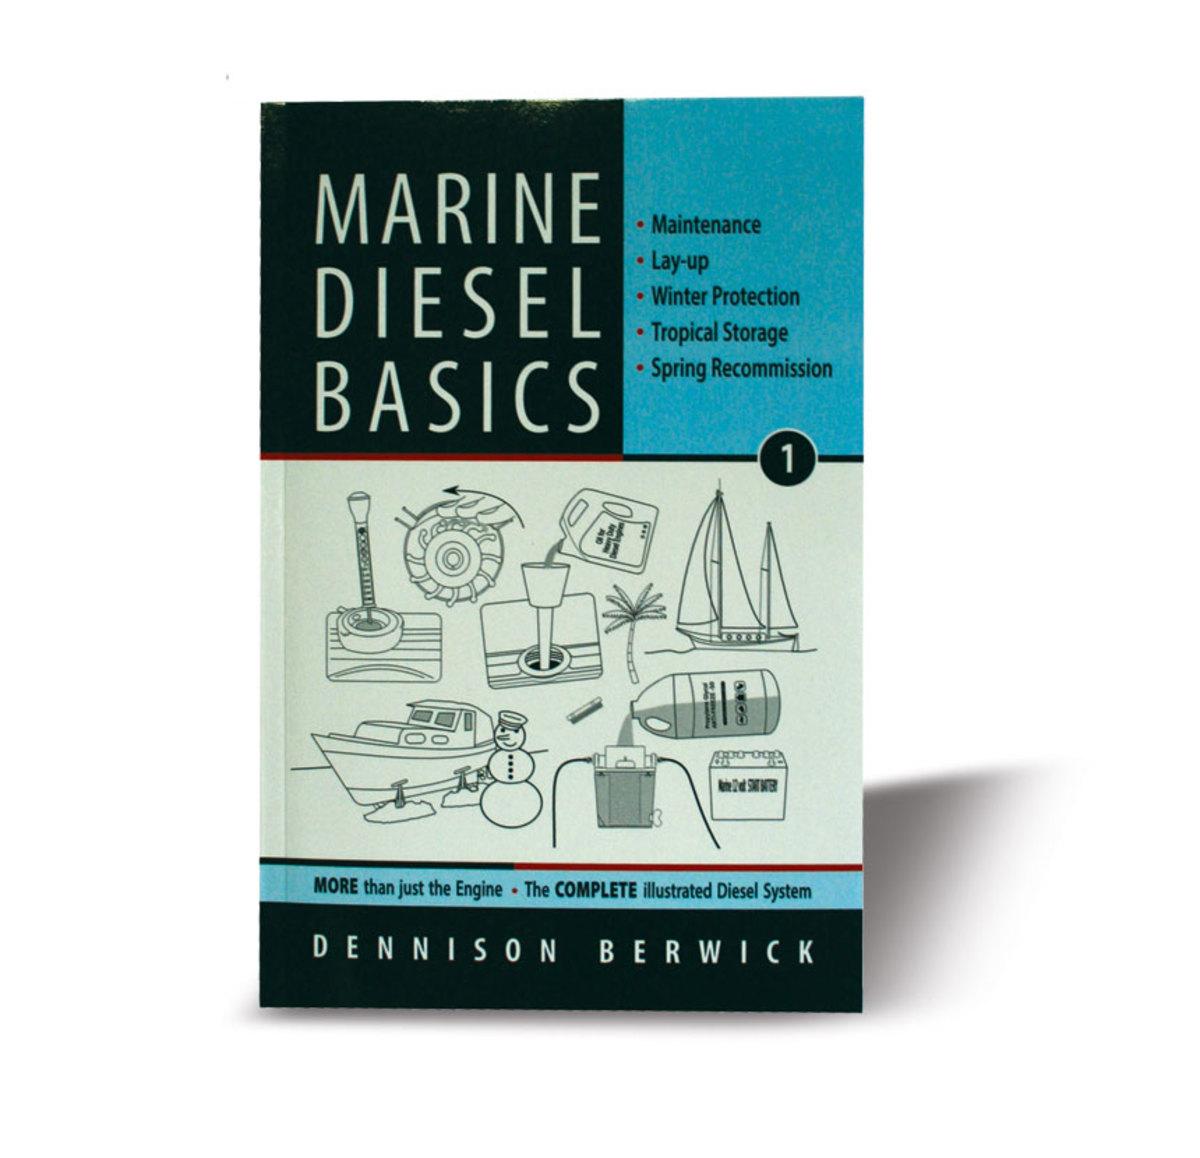 MarineDiesel_BookShadow